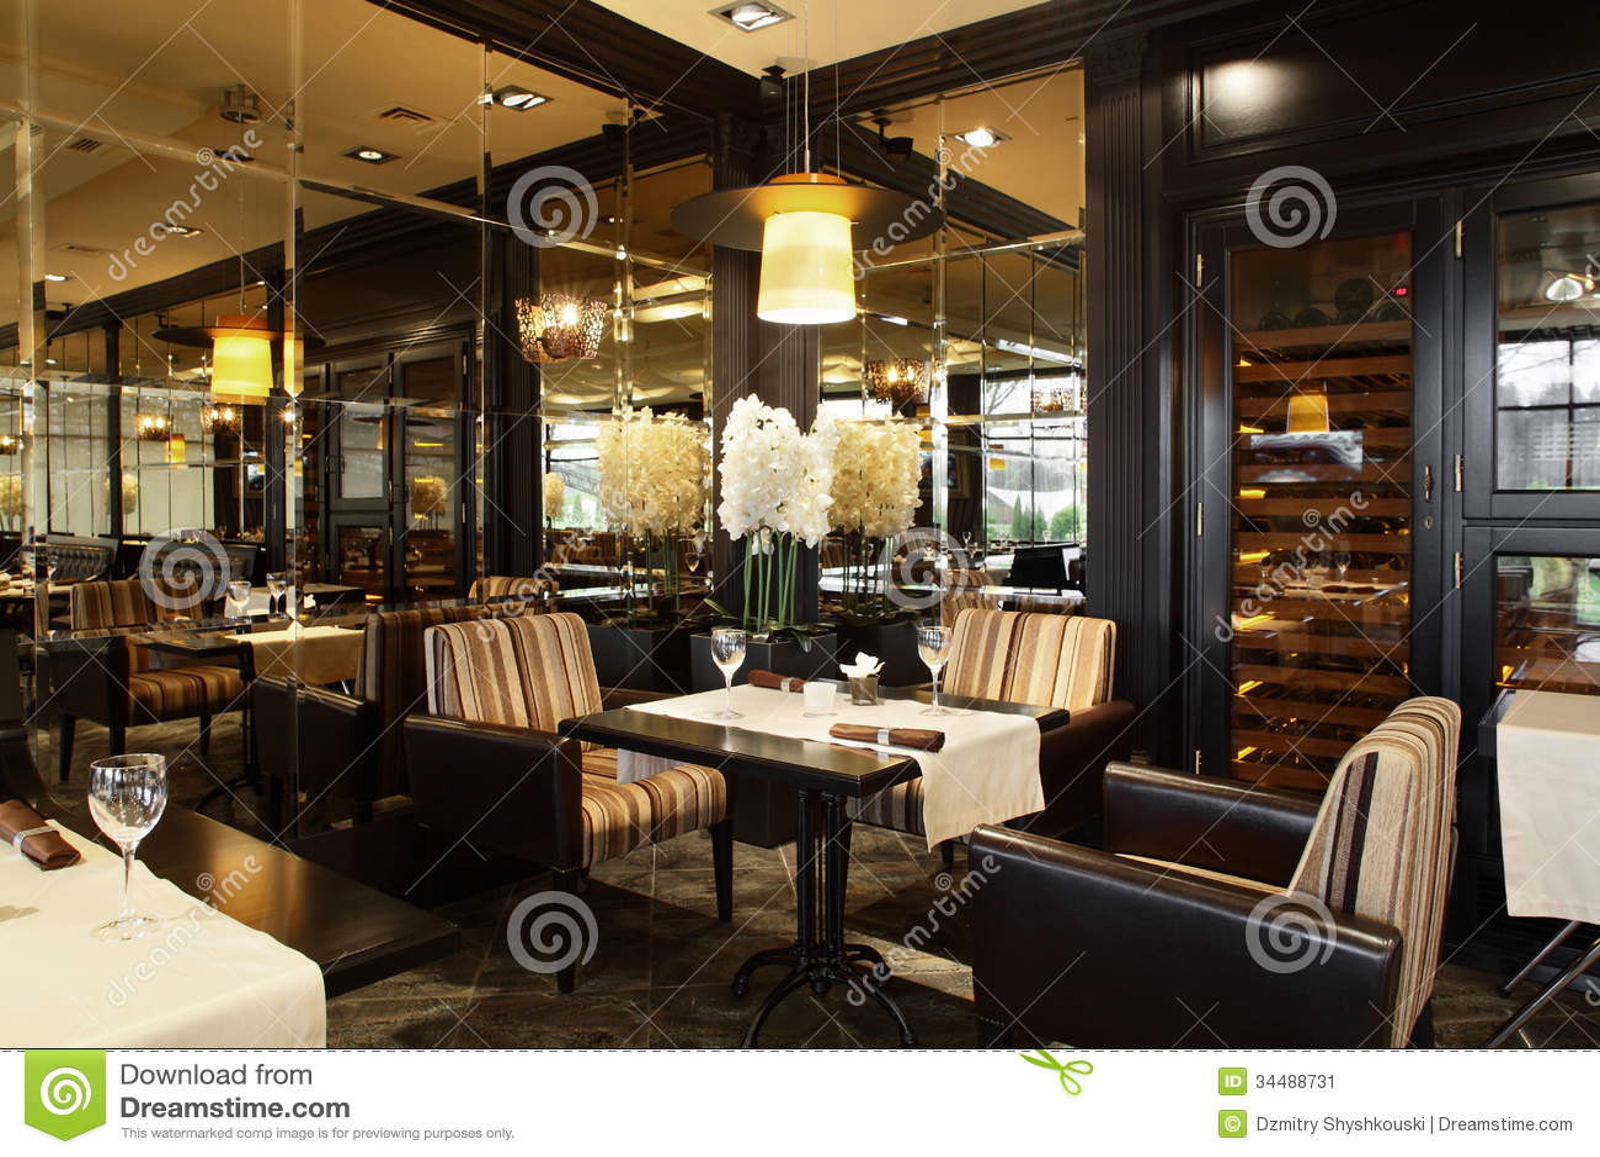 luxury restaurant in european style stock image   image